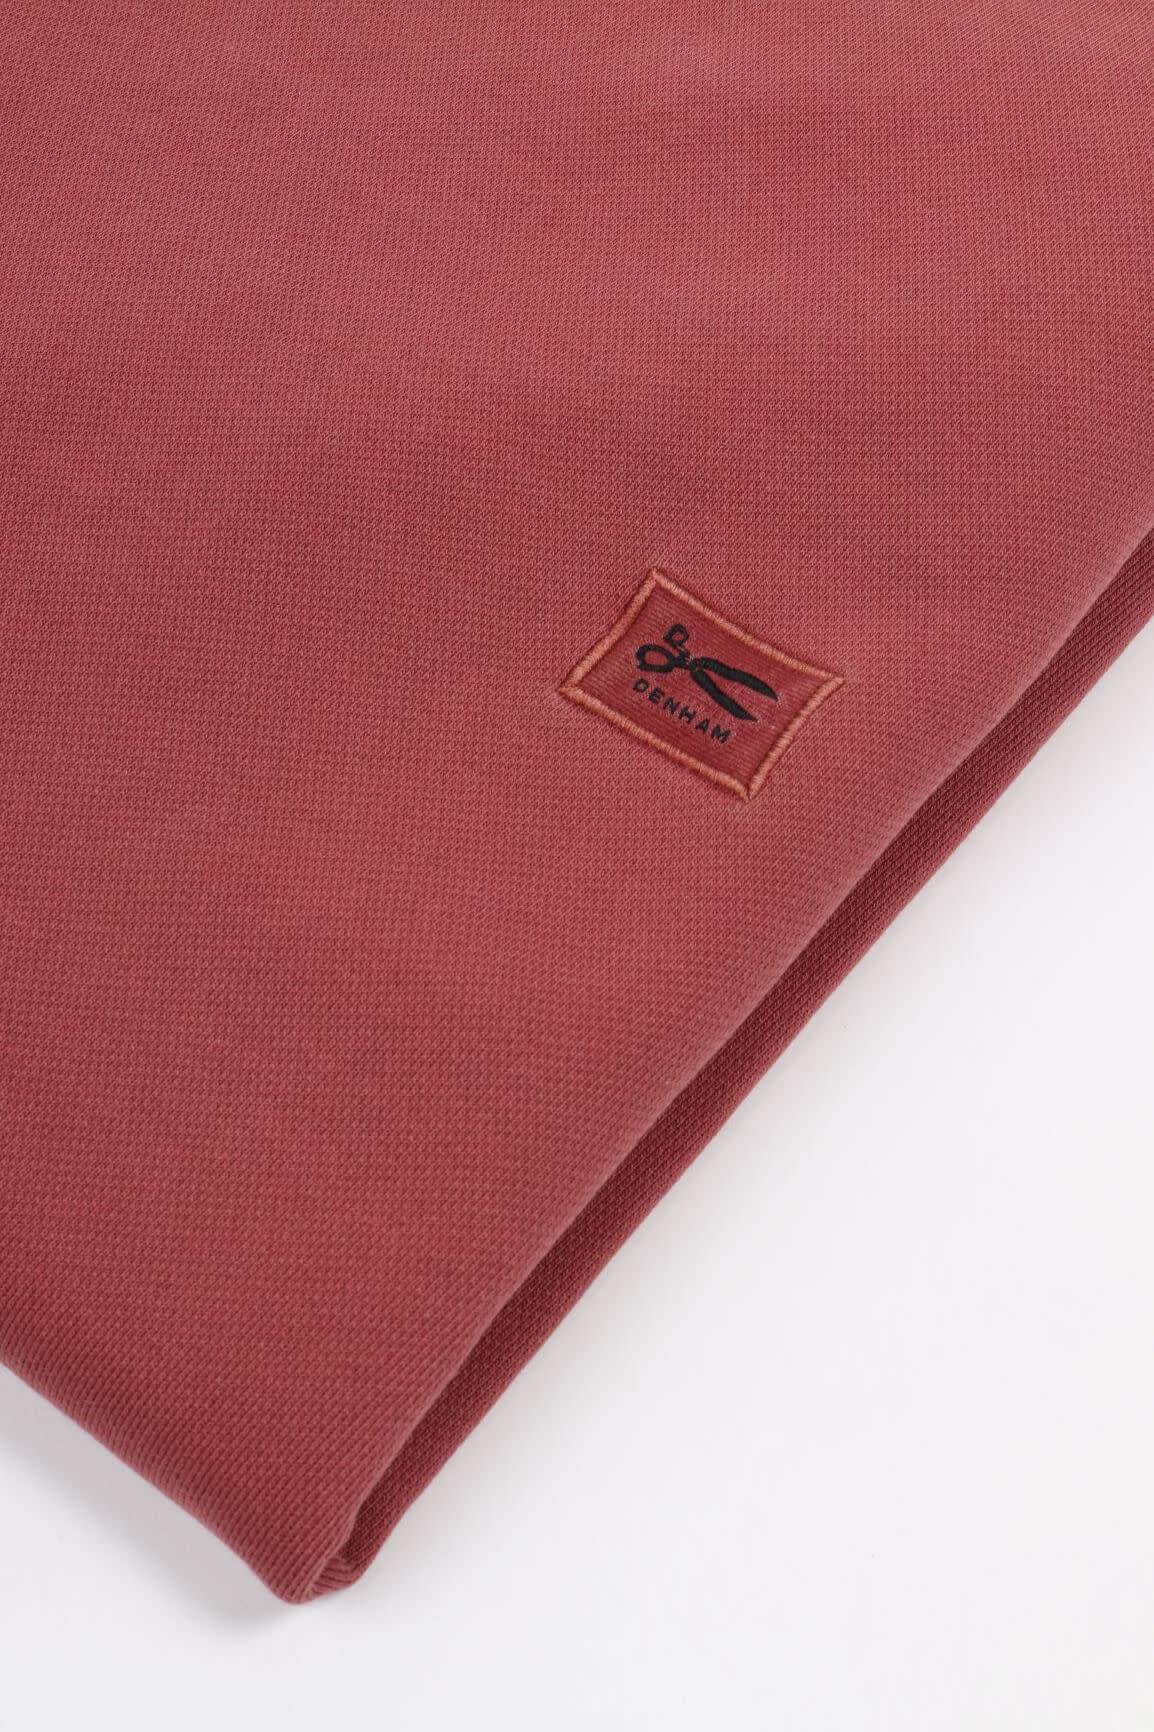 Applique Sweater marsala red-3